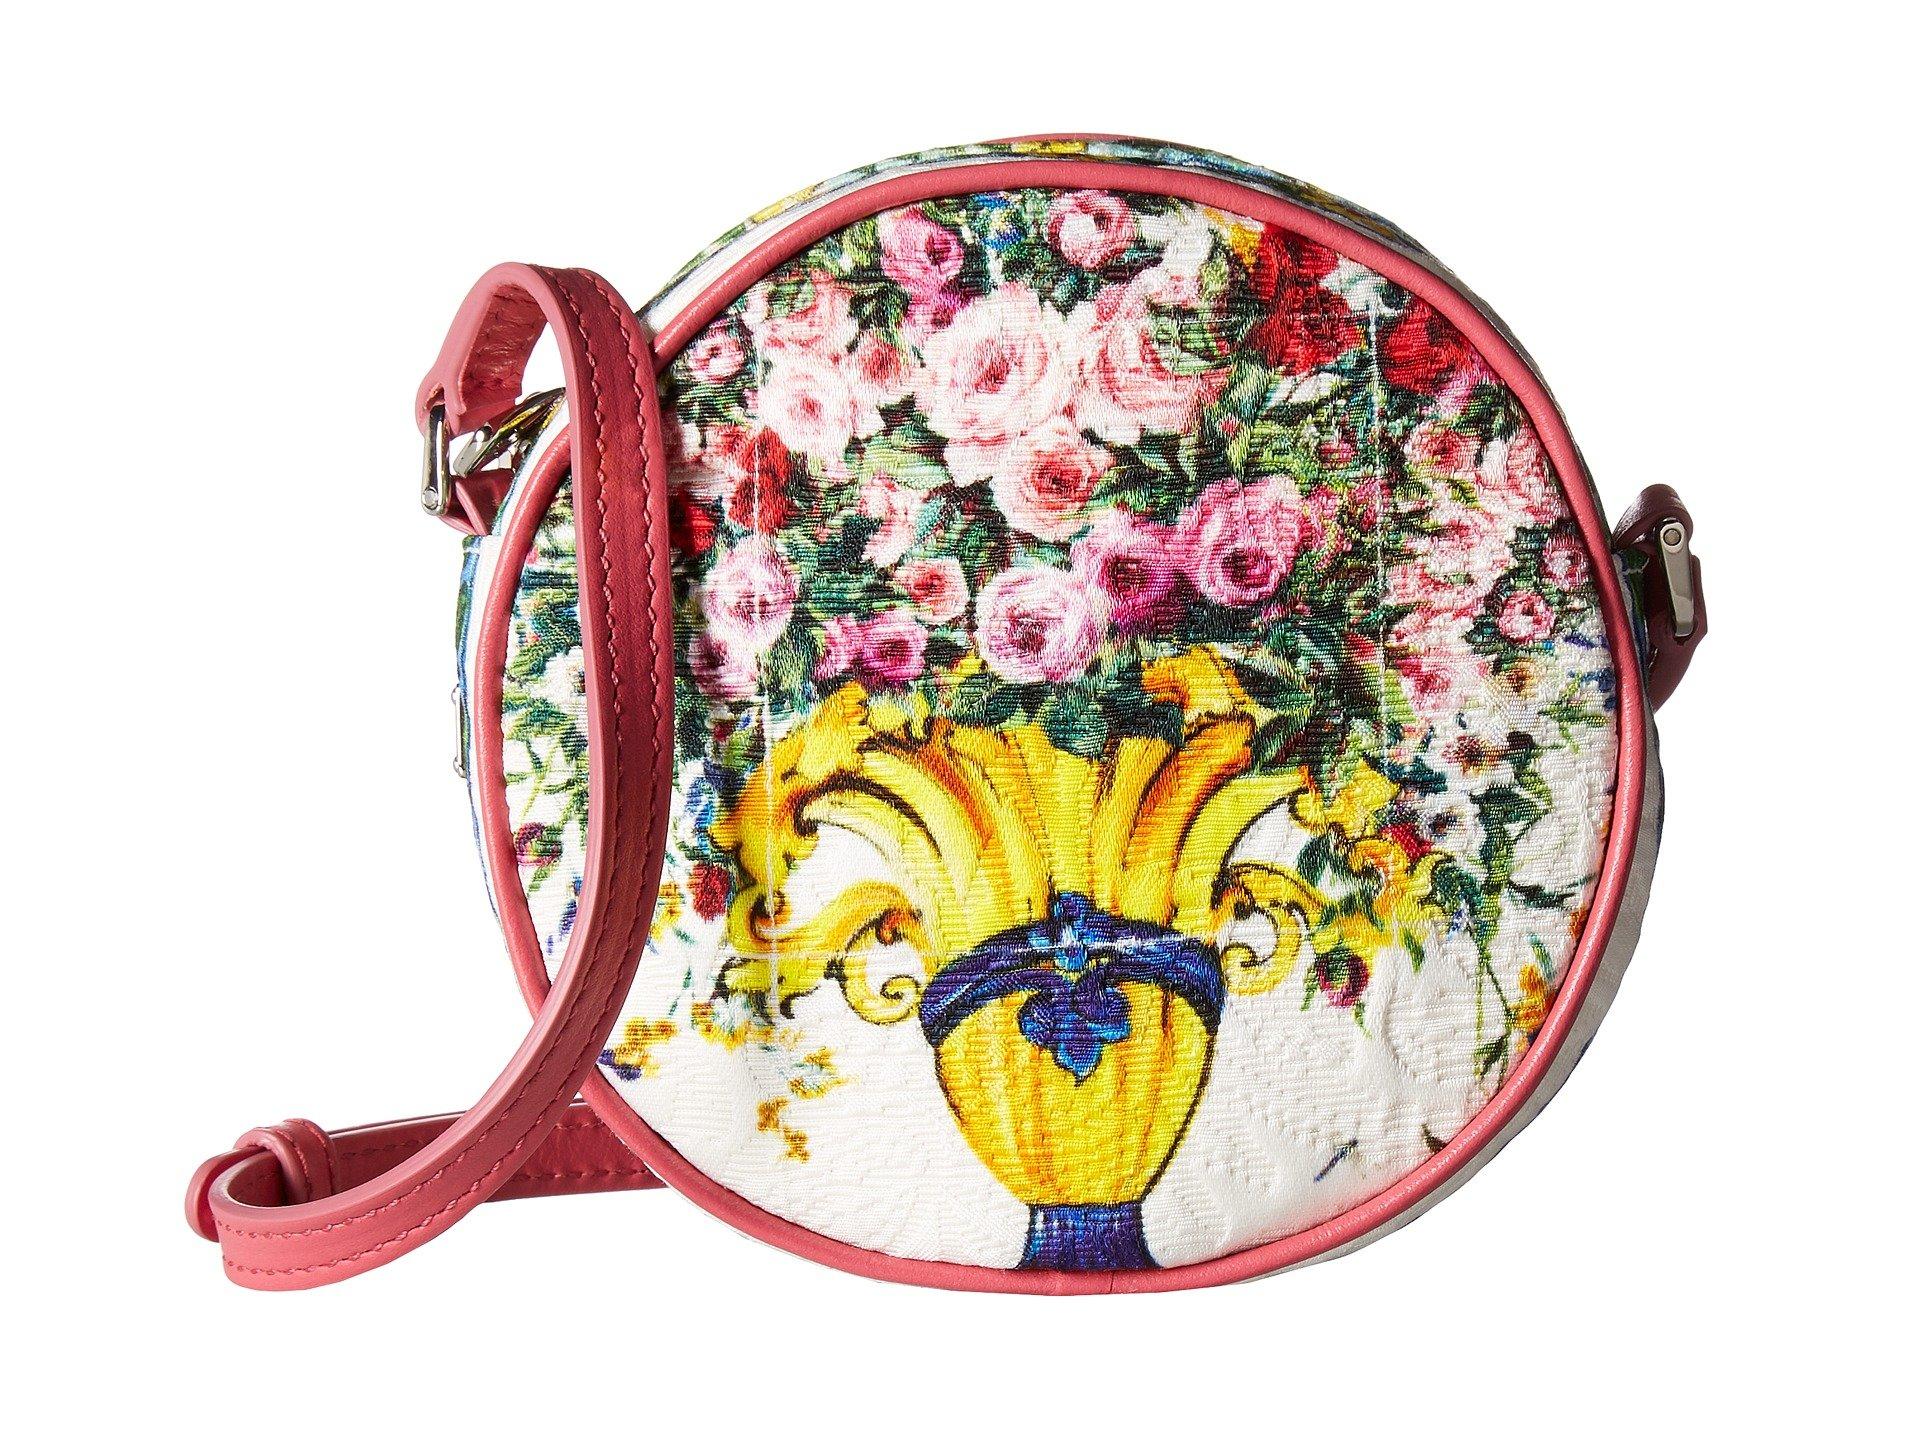 Bolso Cruzado para Mujer Dolce and Gabbana Kids Caltagirone Handbag (Toddler/Little Kids/Big Kids)  + Dolce & Gabbana en VeoyCompro.net